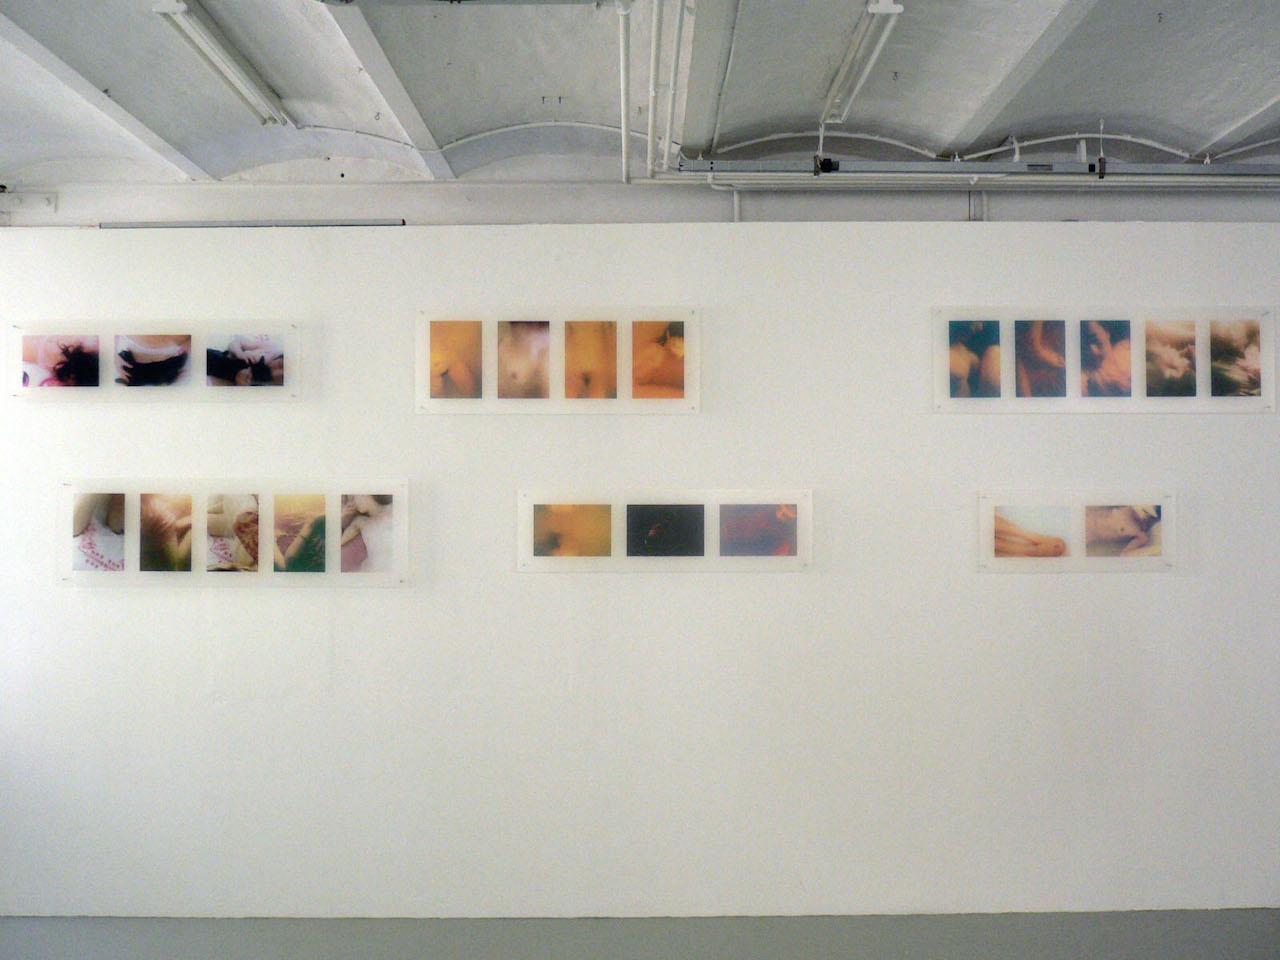 Girls,girls,girls-Accrochage centre d'art de Neuchatel -CAN-2005-switzerlan5.JPG